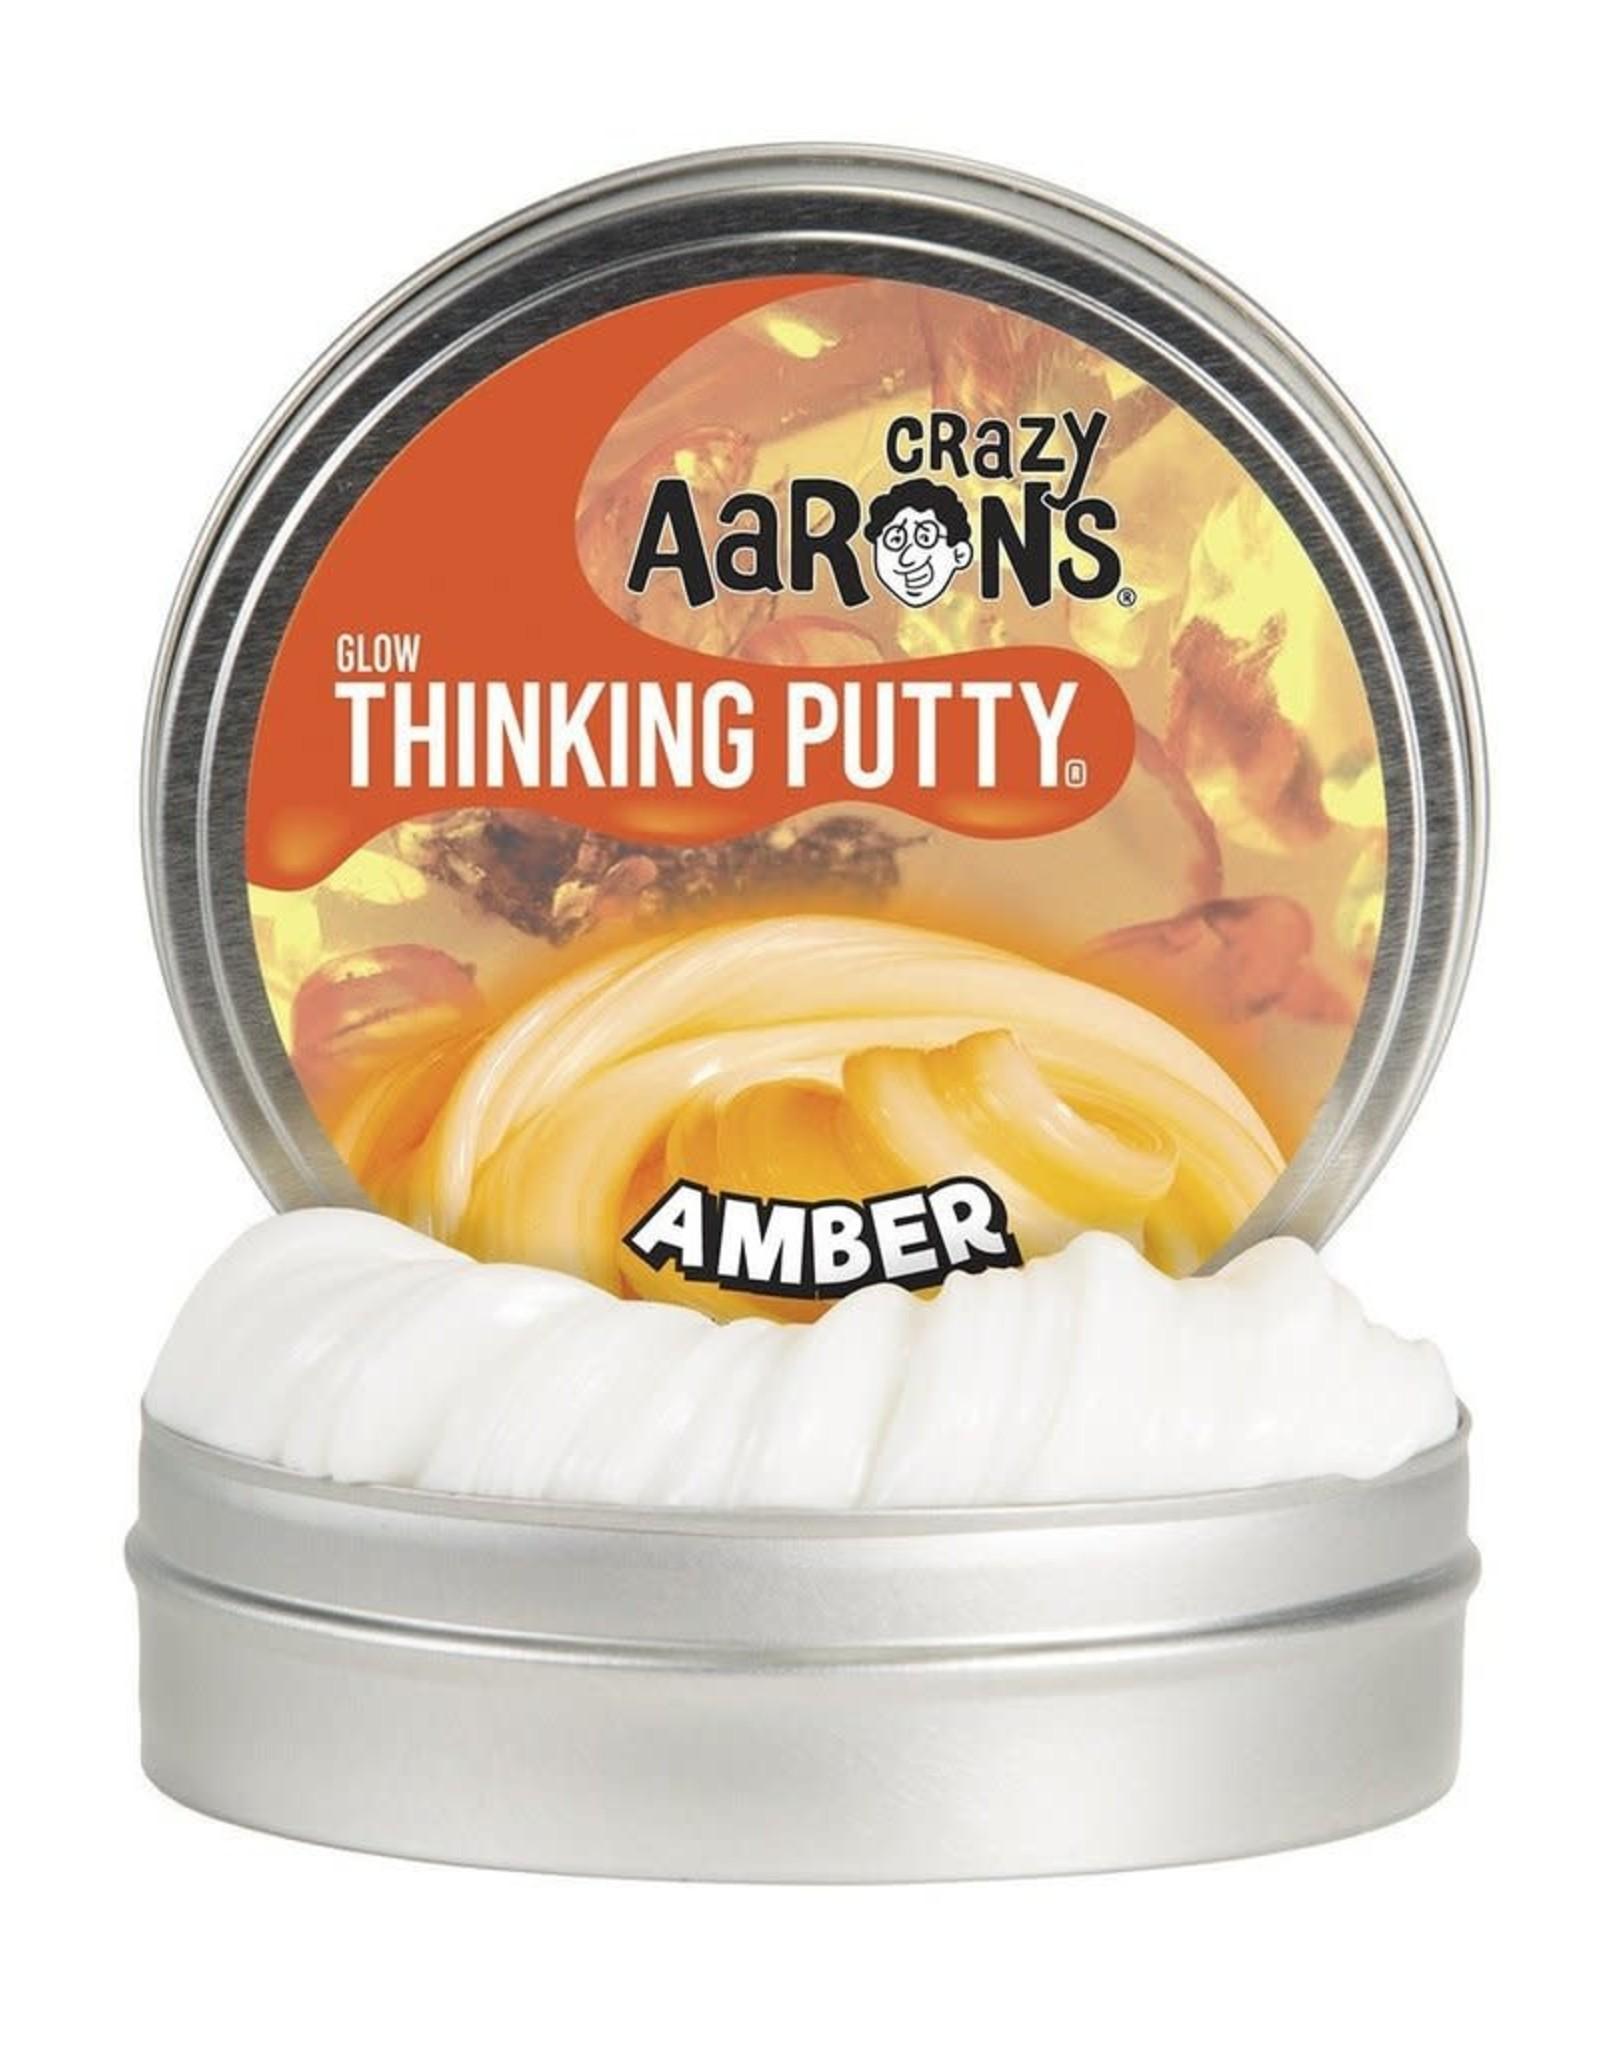 Crazy Aaron's Thinking Putty Amber Mini